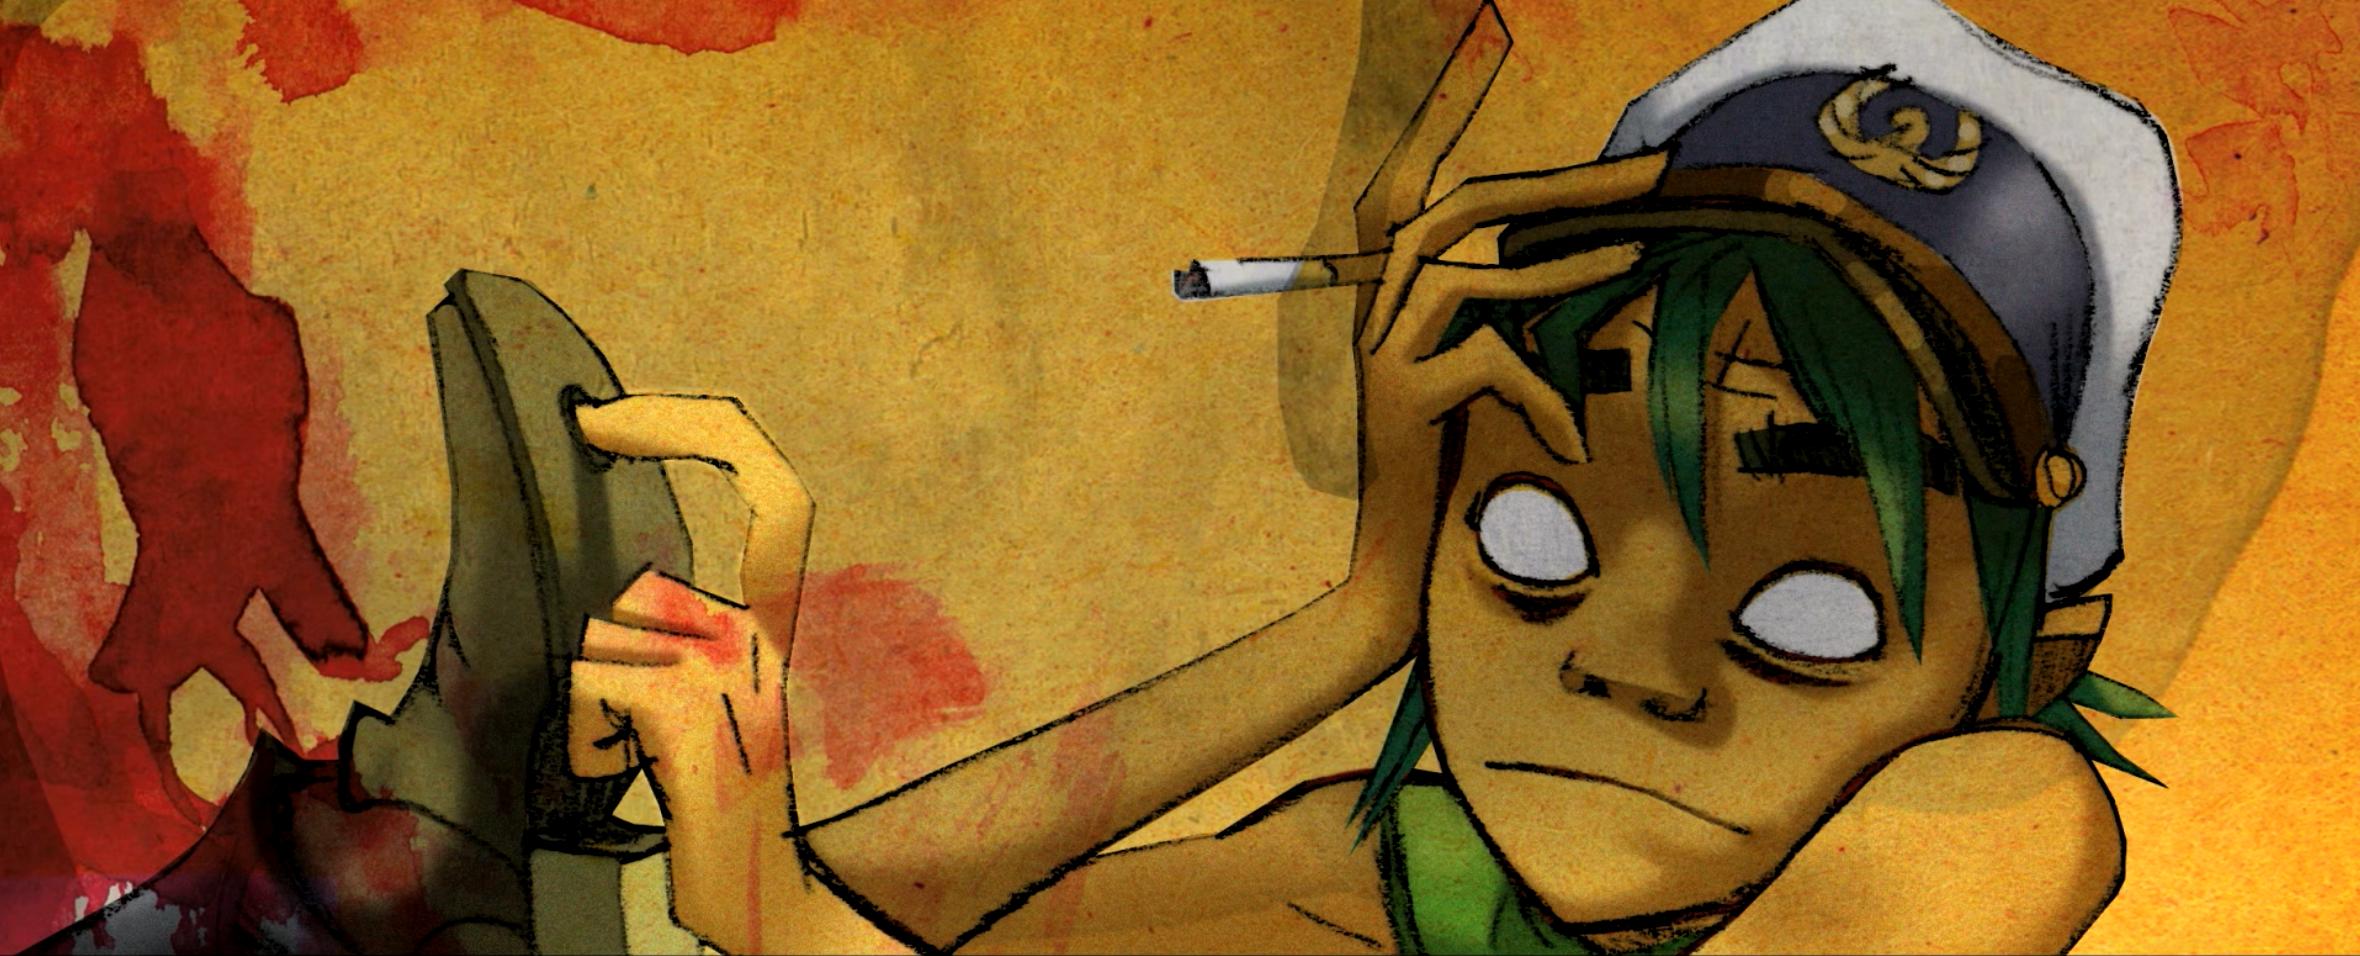 empire ants  gorillaz  Dibujos Diseo de personajes Graffitis